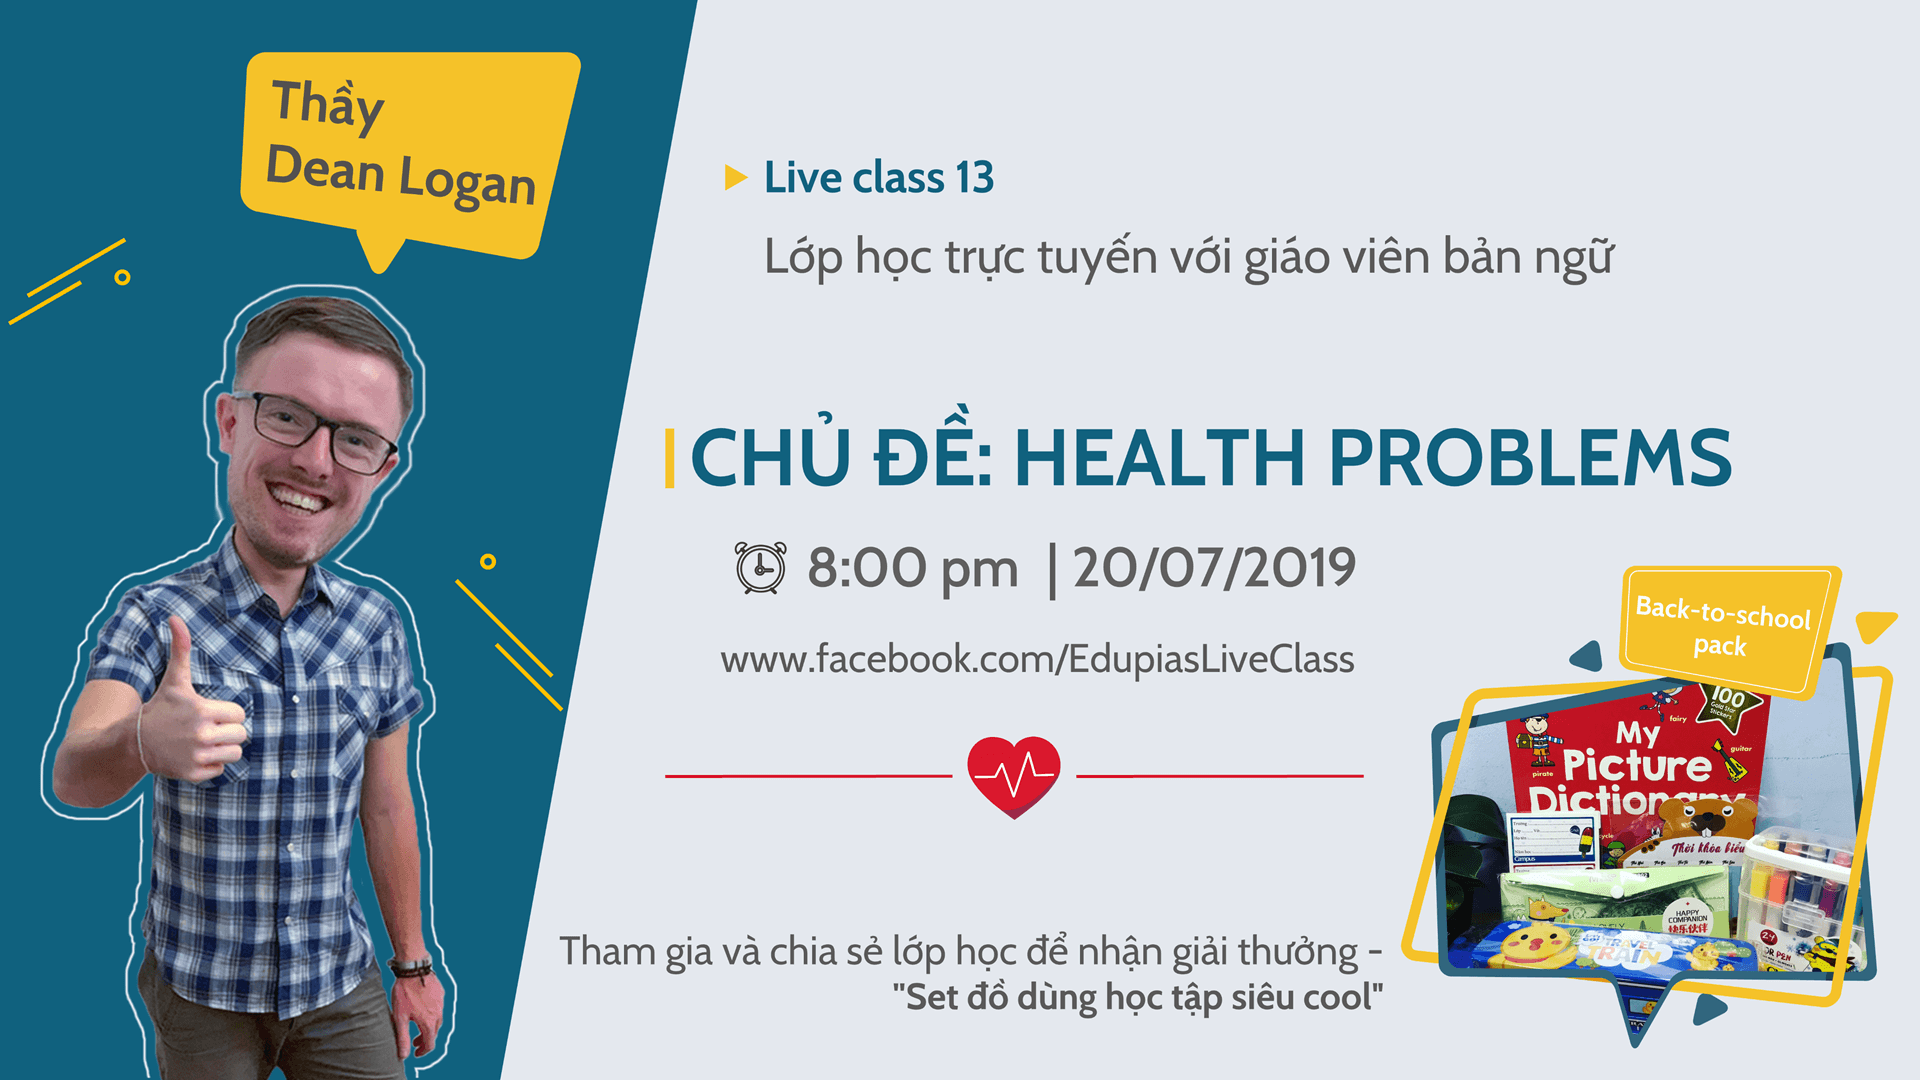 Live class tuần 13 - Chủ đề: HEALTH PROBLEMS